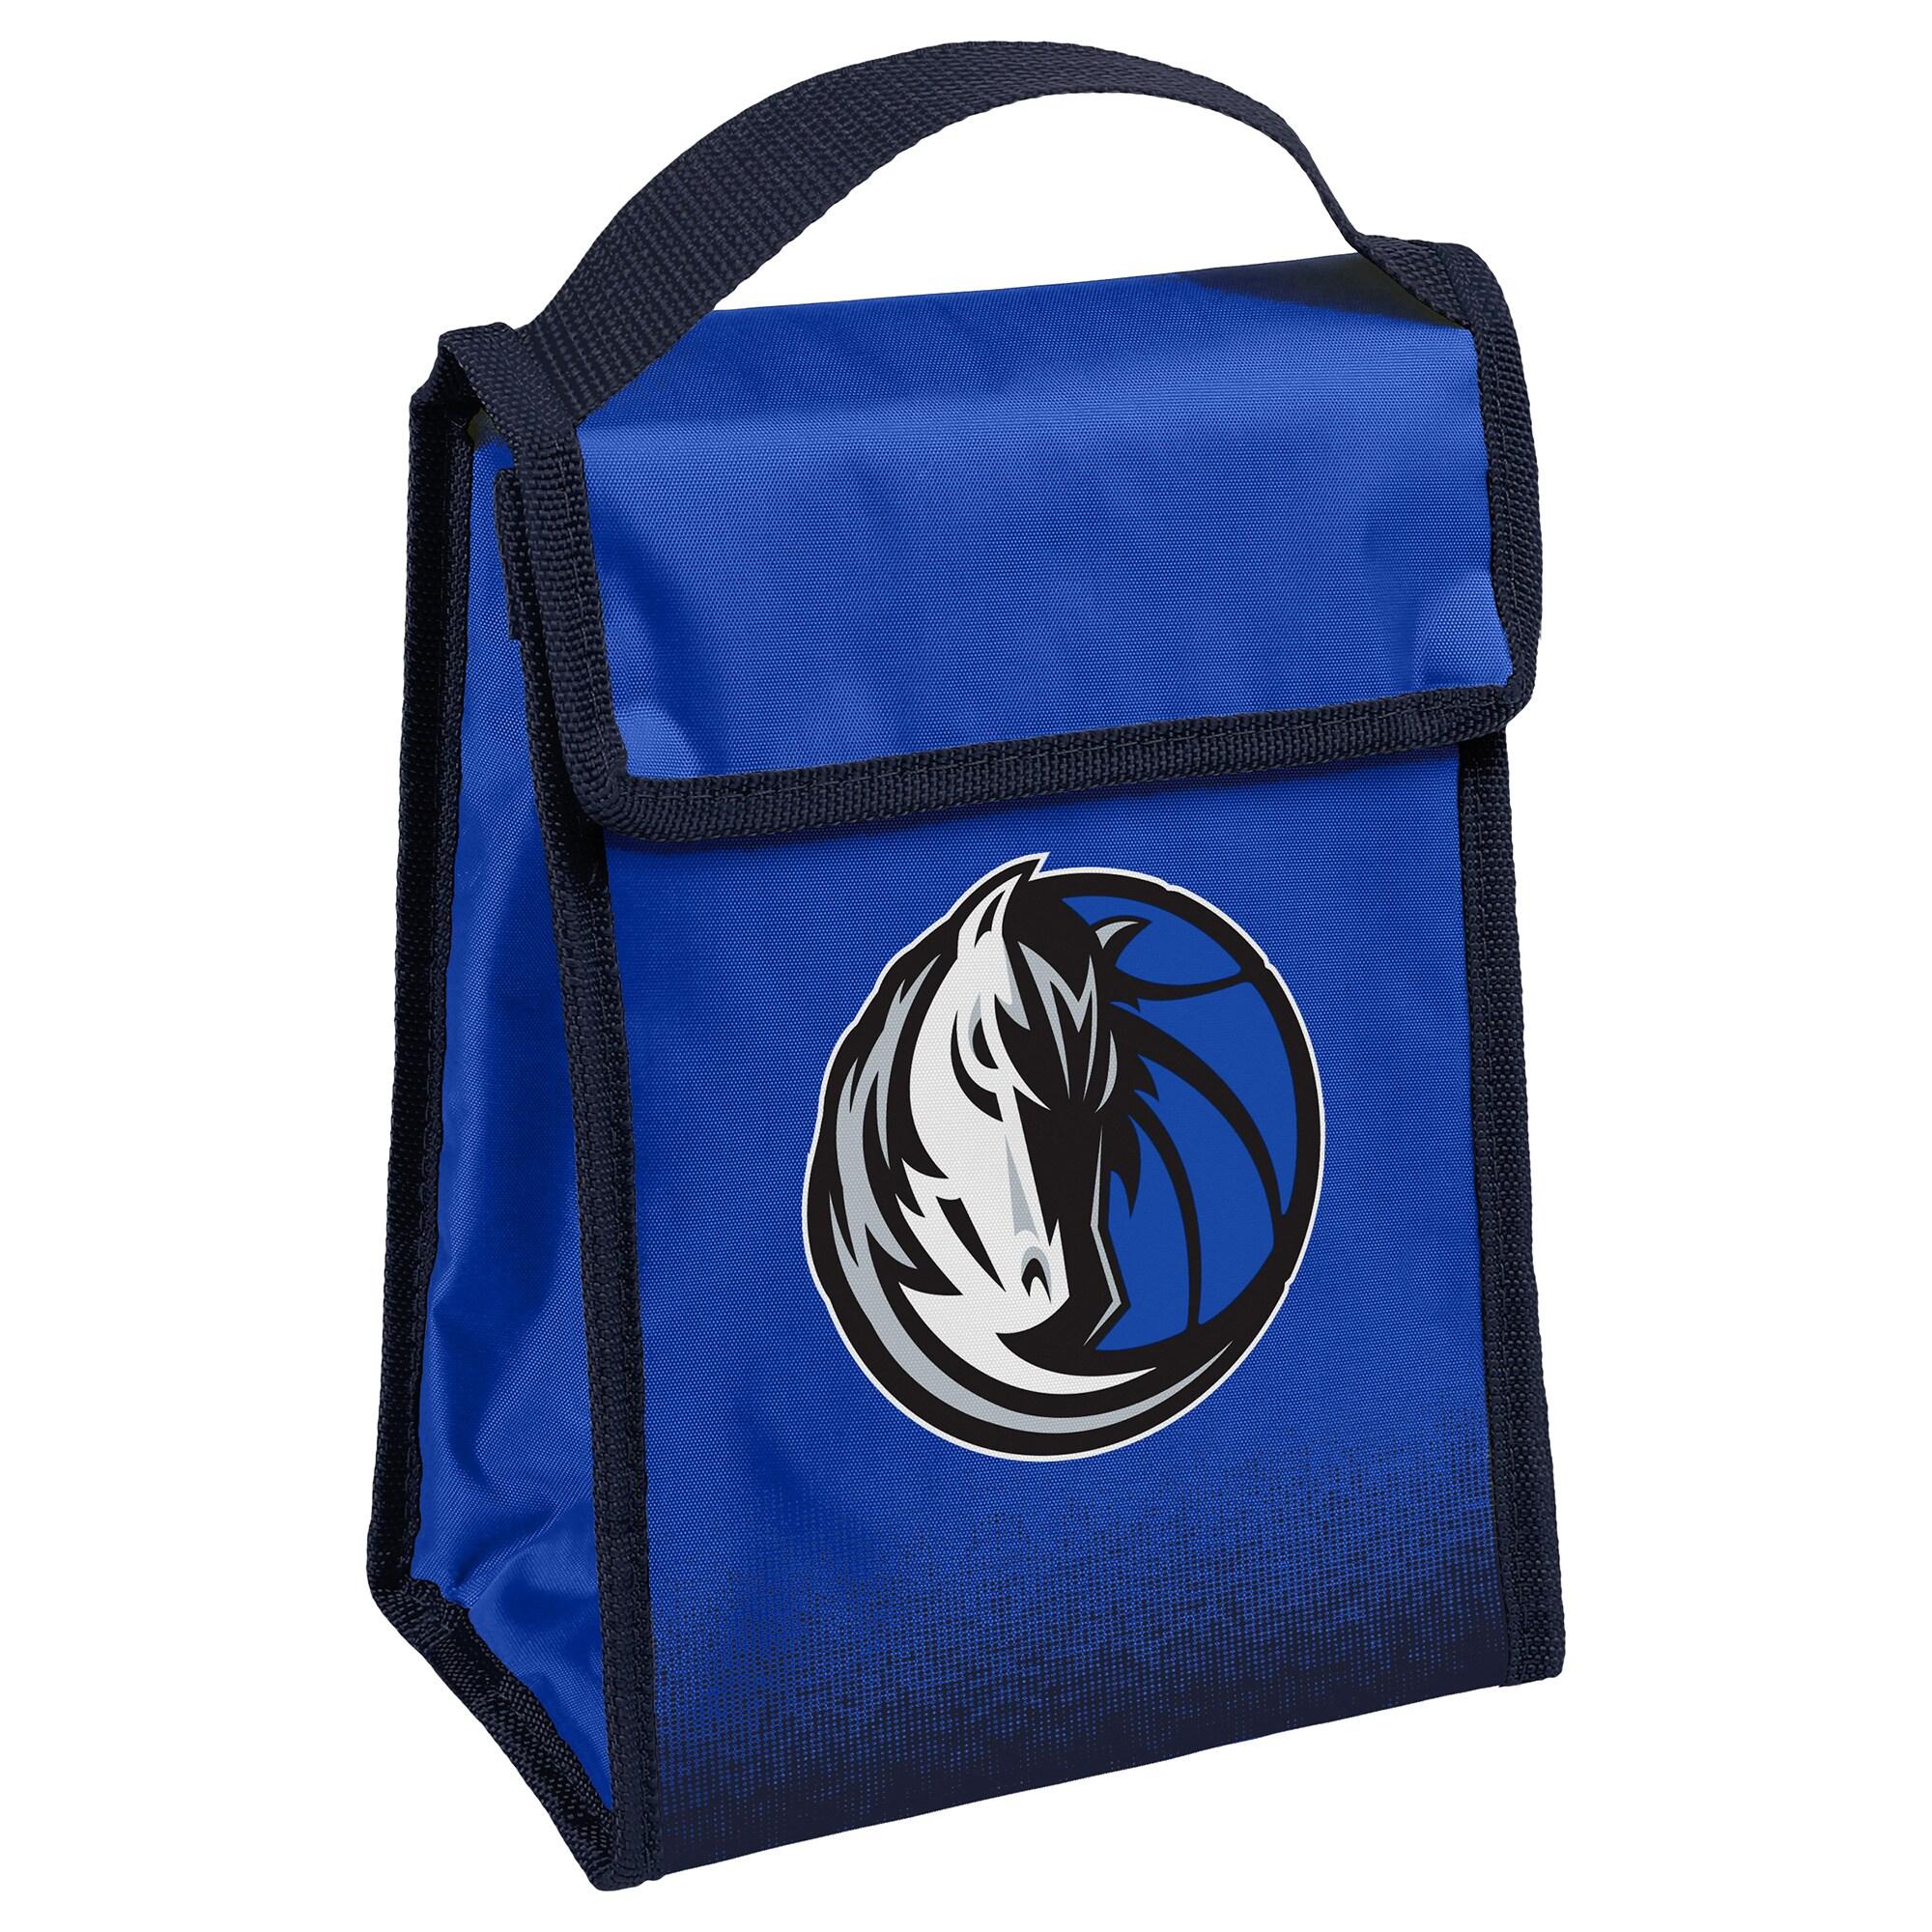 Dallas Mavericks Gradient Lunch Bag